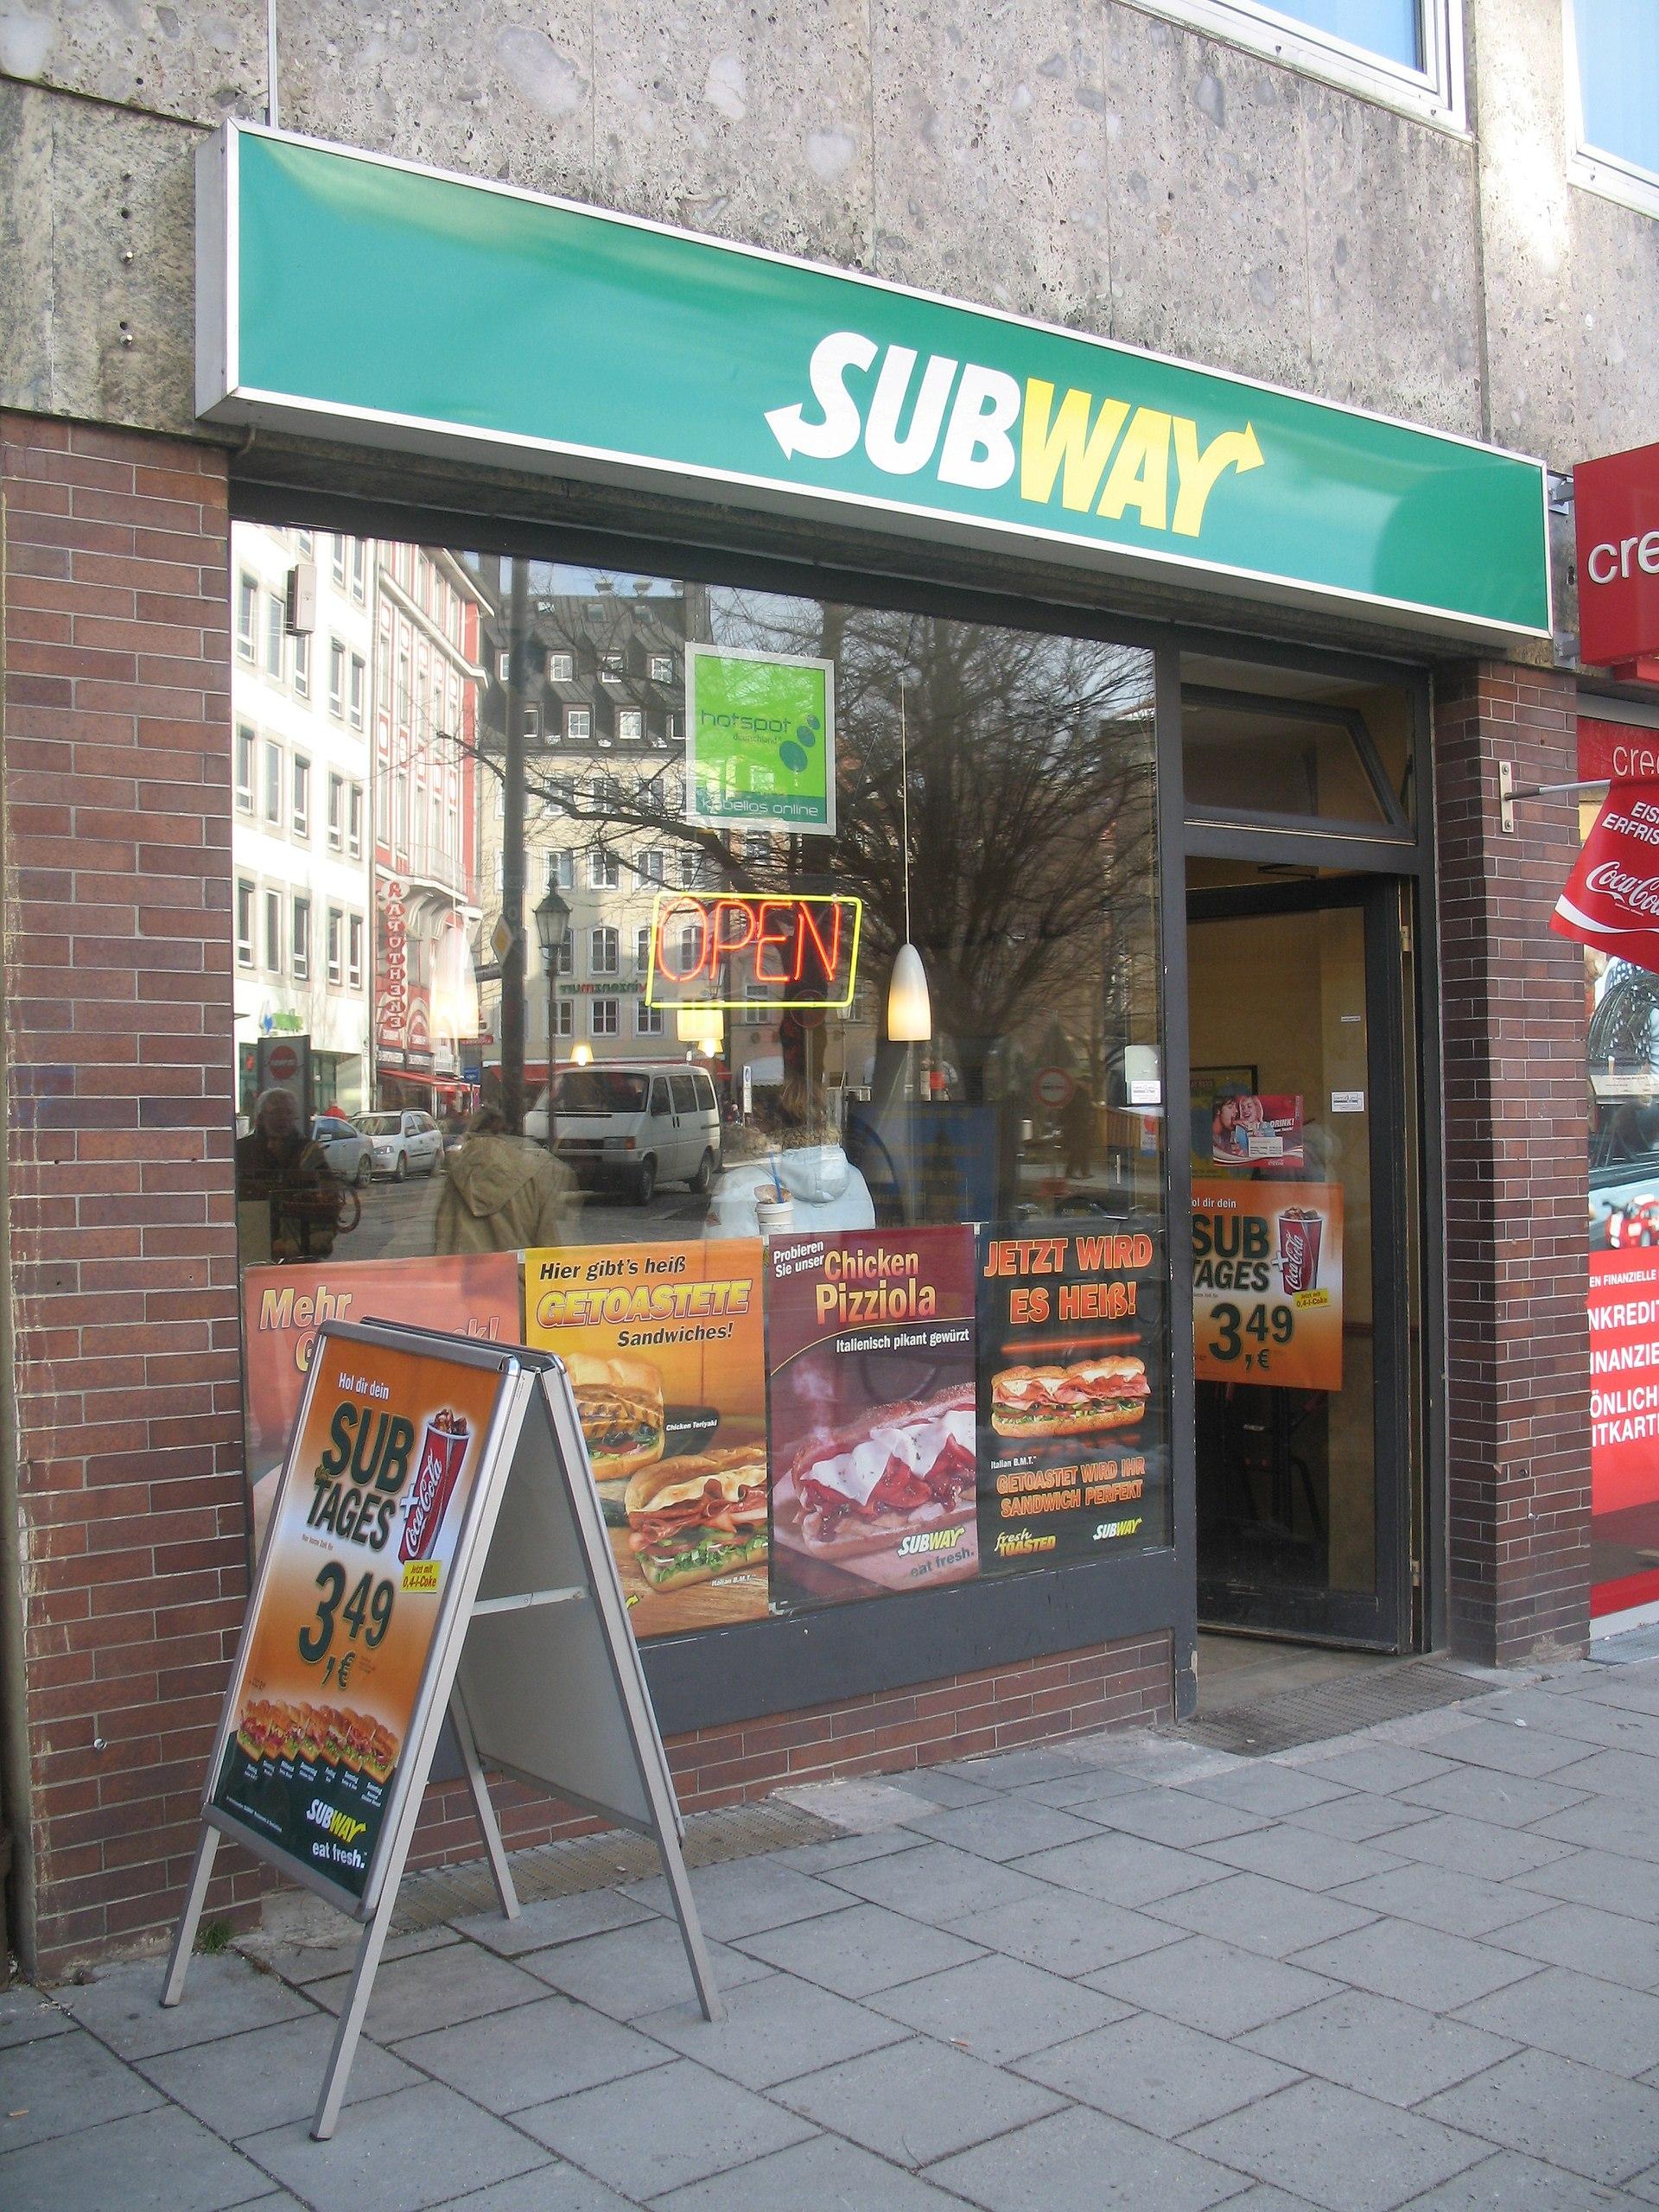 Subway Restaurant In London England